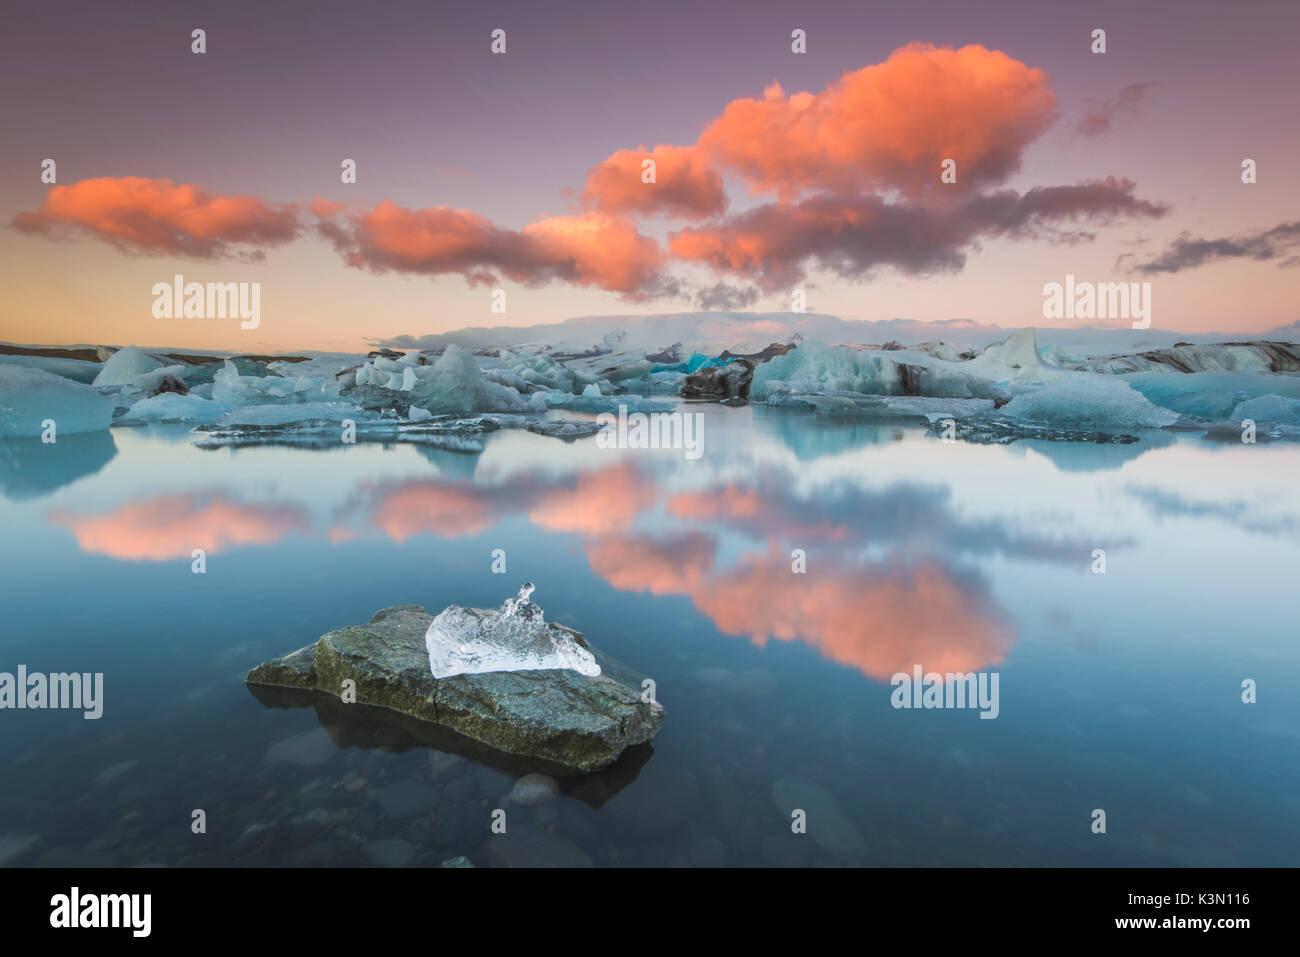 Jokulsarlon, Eastern Iceland, Iceland, Northern Europe. The iconic little icebergs lined on the black sand beach. Stock Photo